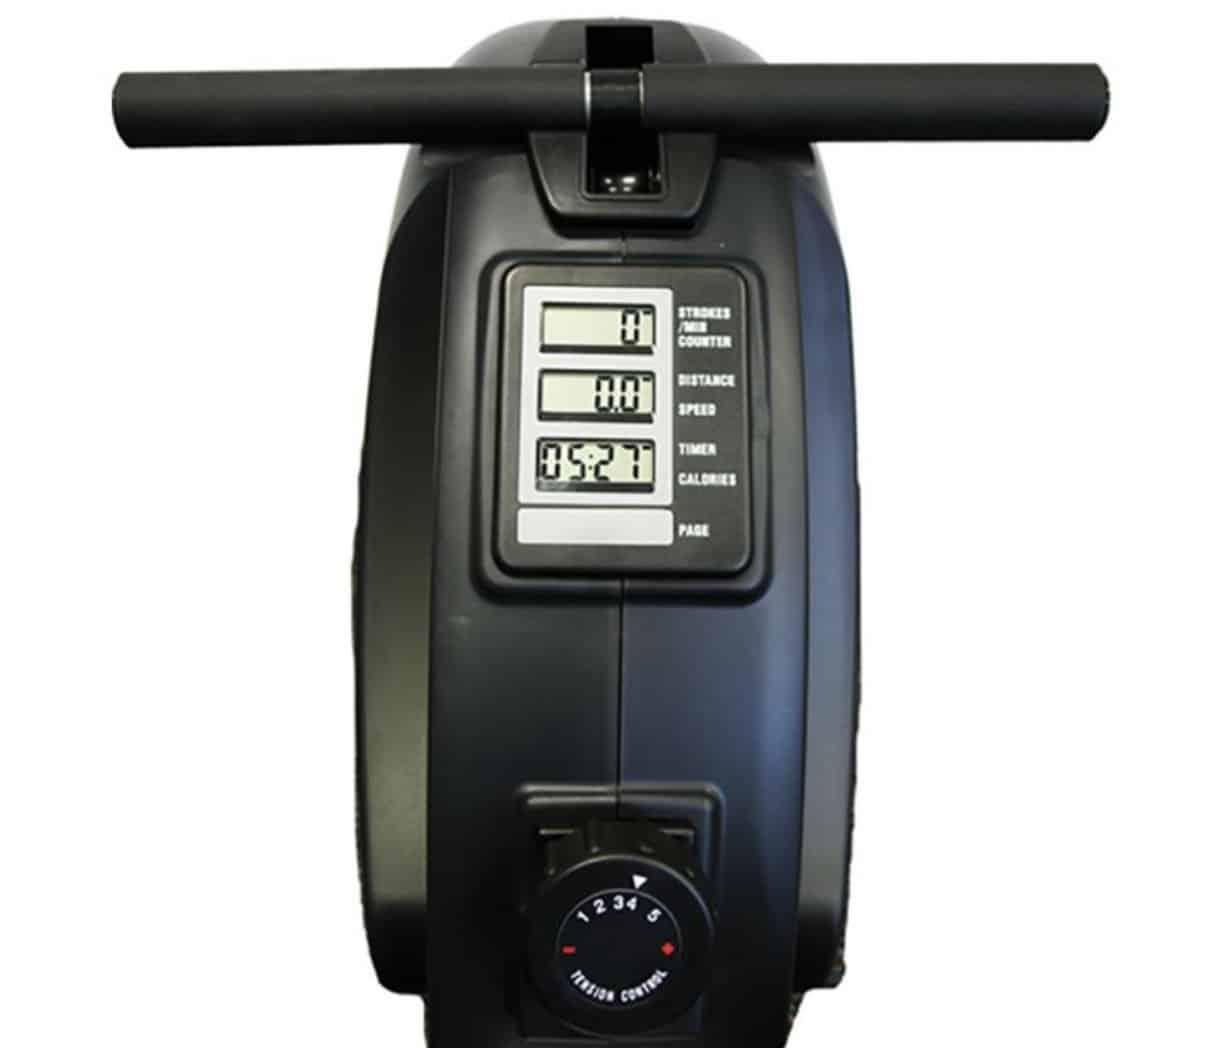 LifeSpan RW1000 Rowing Machine Monitor